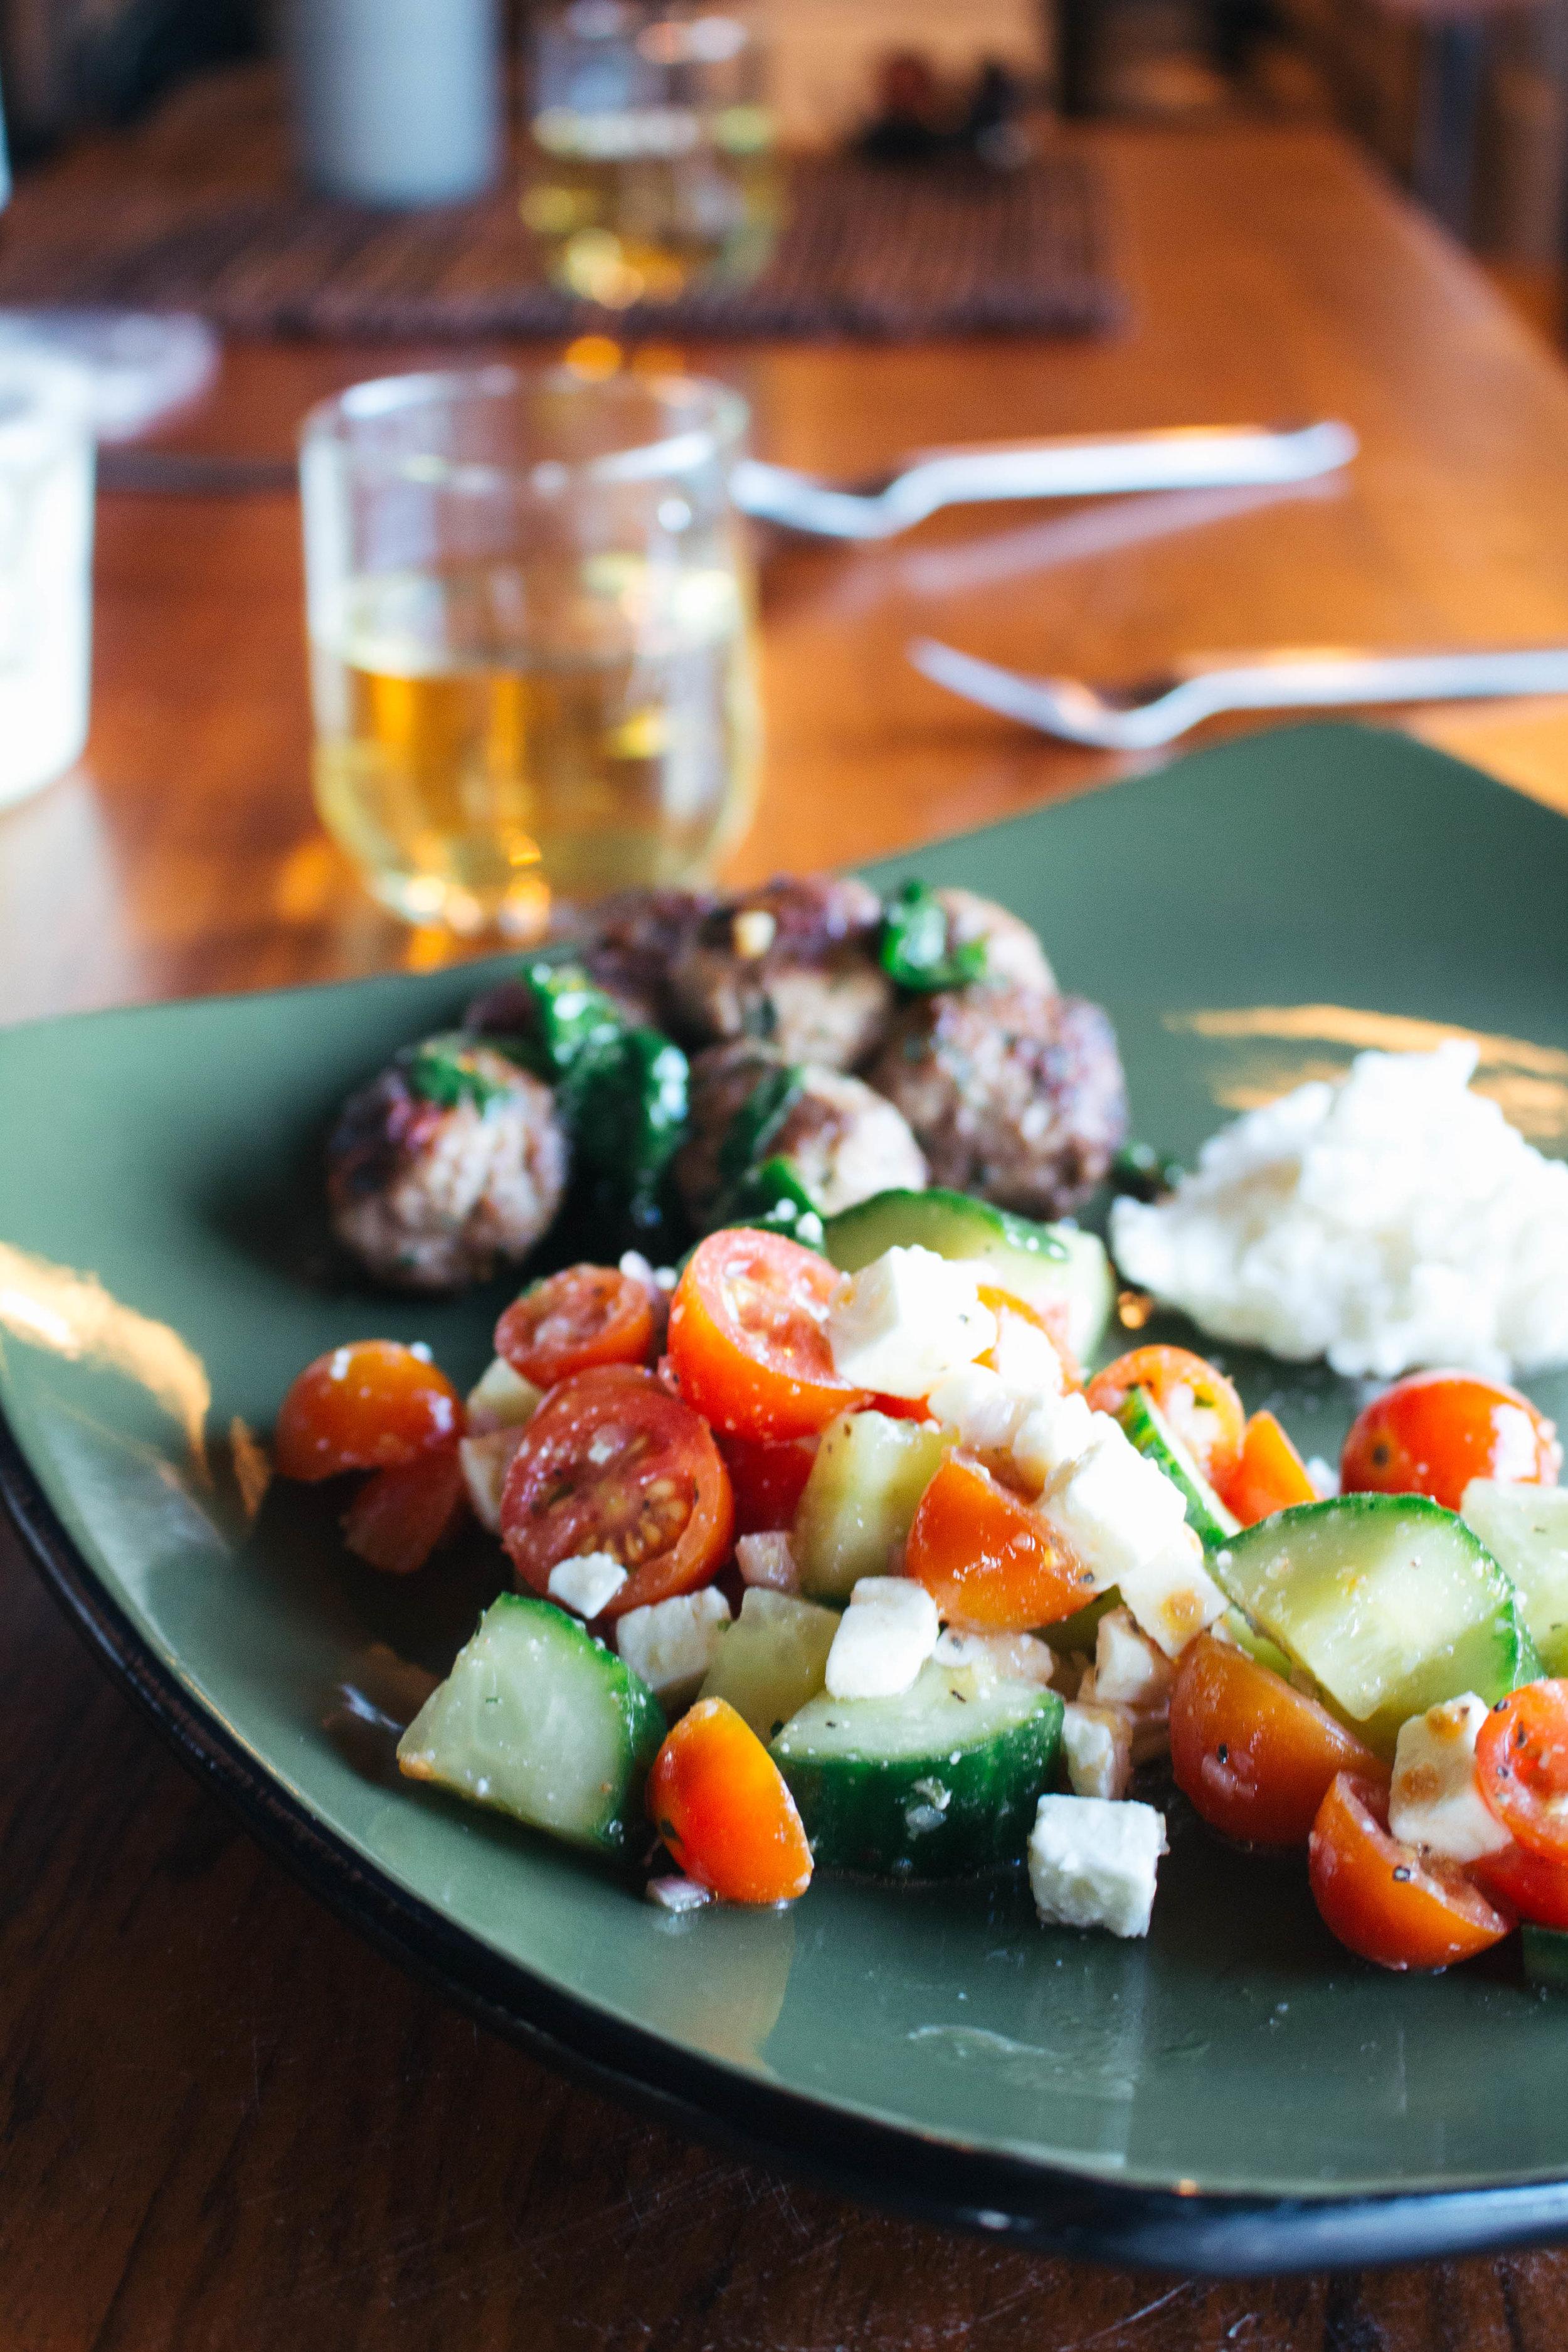 Cucumber-Tomato Salad with Feta via Worthy Pause